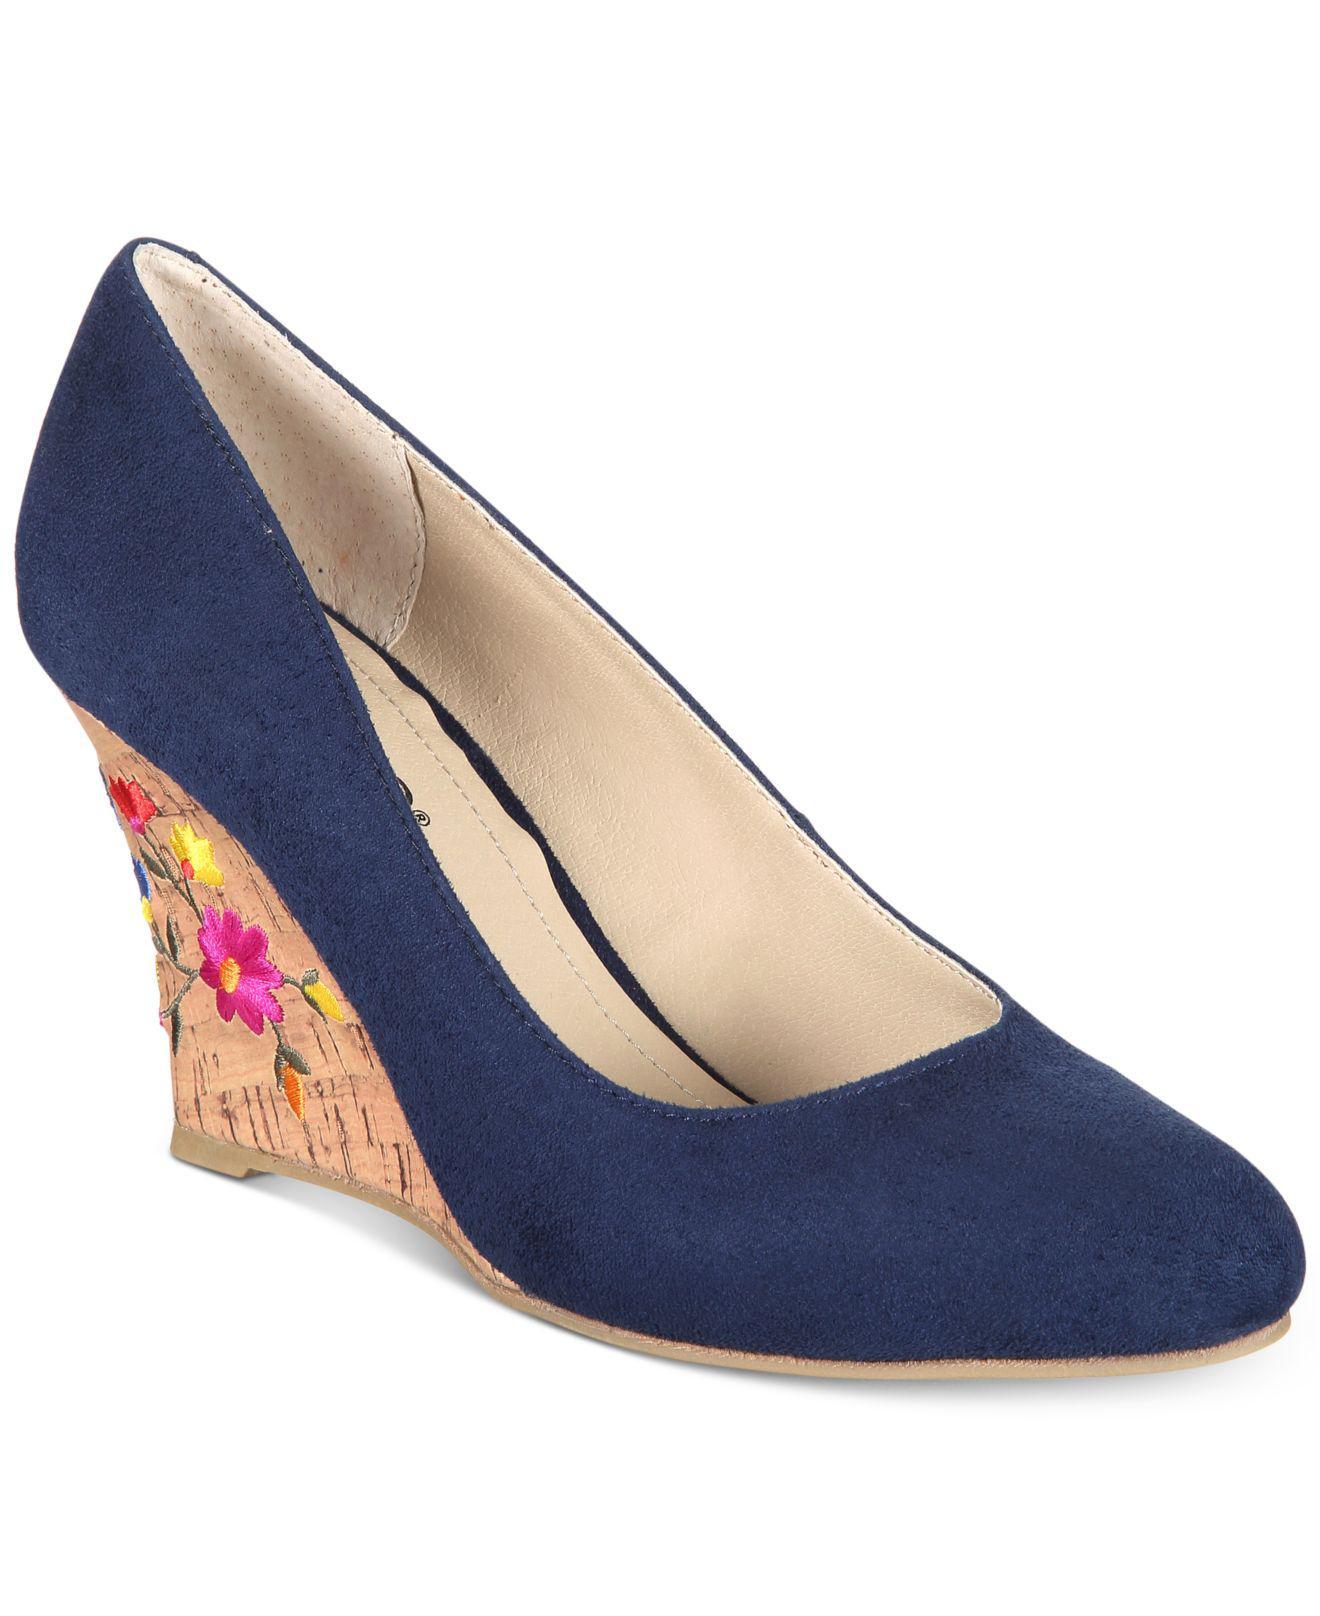 1f0dad3a7974 Lyst - Rialto Calypso Wedge Sandals in Blue